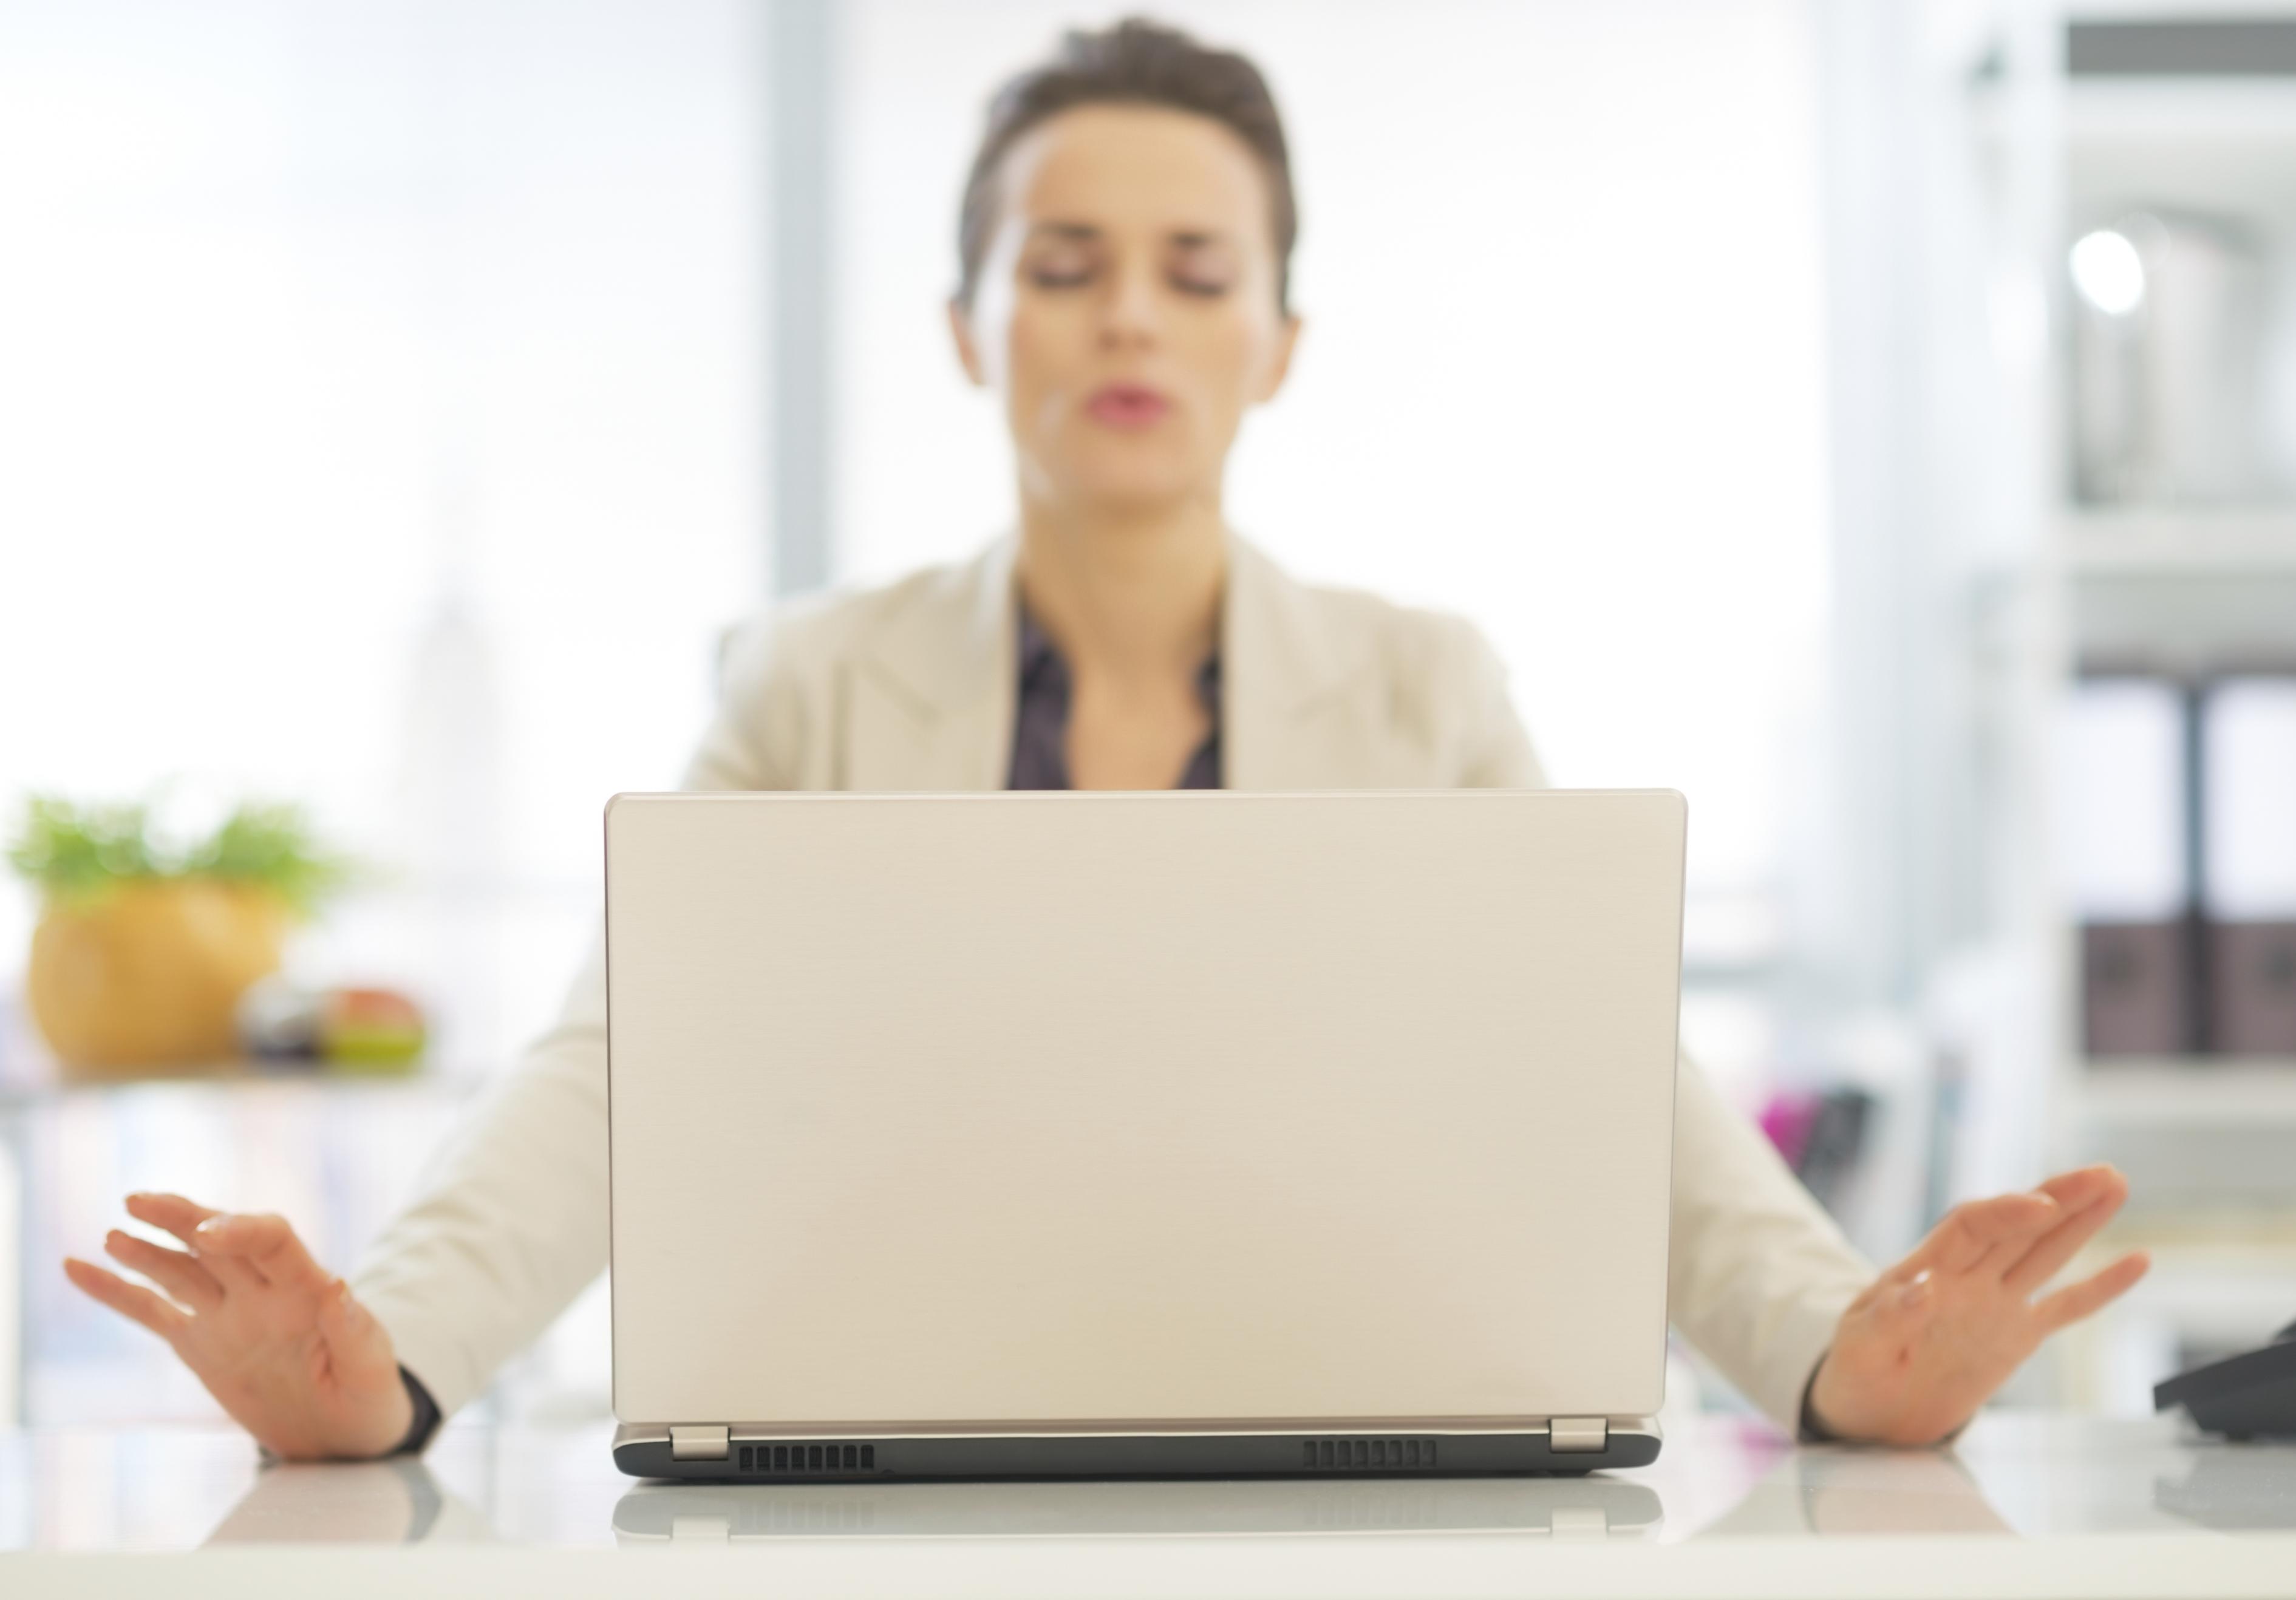 Case studies on job stress